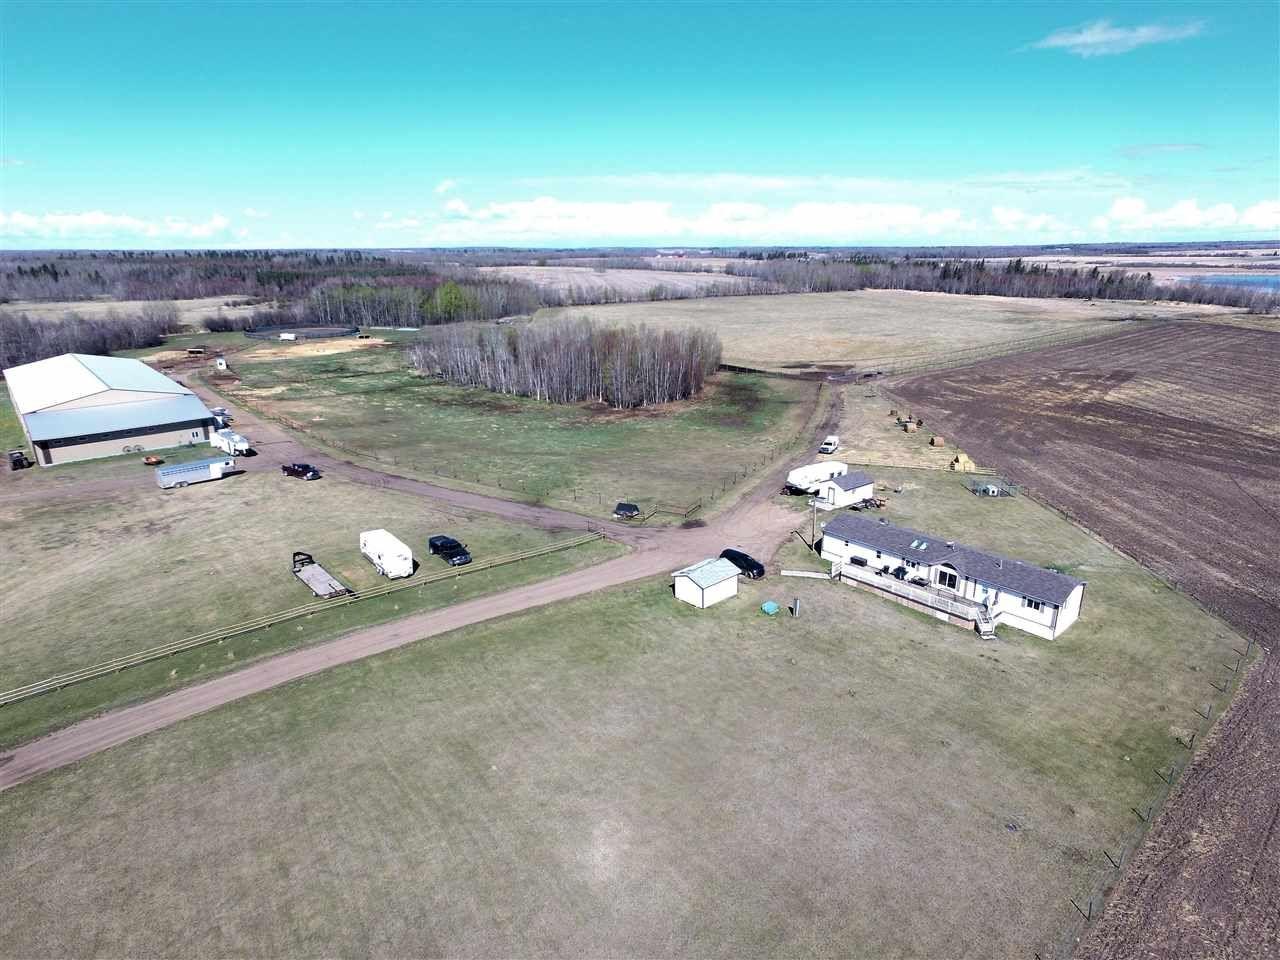 Main Photo: 2310 Twsp 554: Rural Lac Ste. Anne County House for sale : MLS®# E4228475